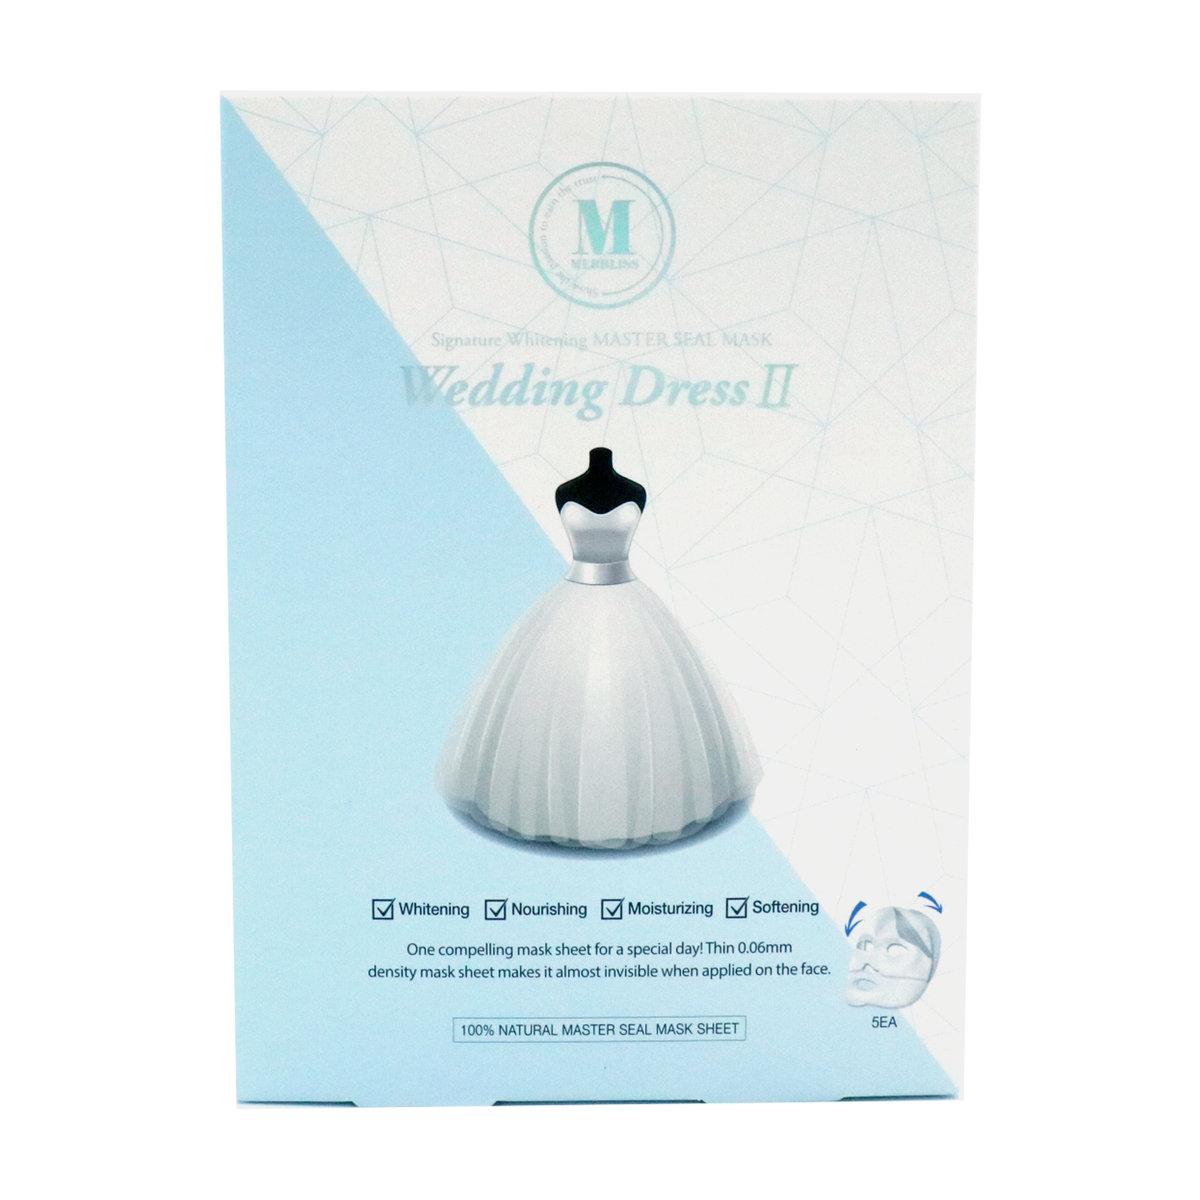 MERBLISS | Wedding Dress Mask (2nd Generation) 5pcs | HKTVmall ...